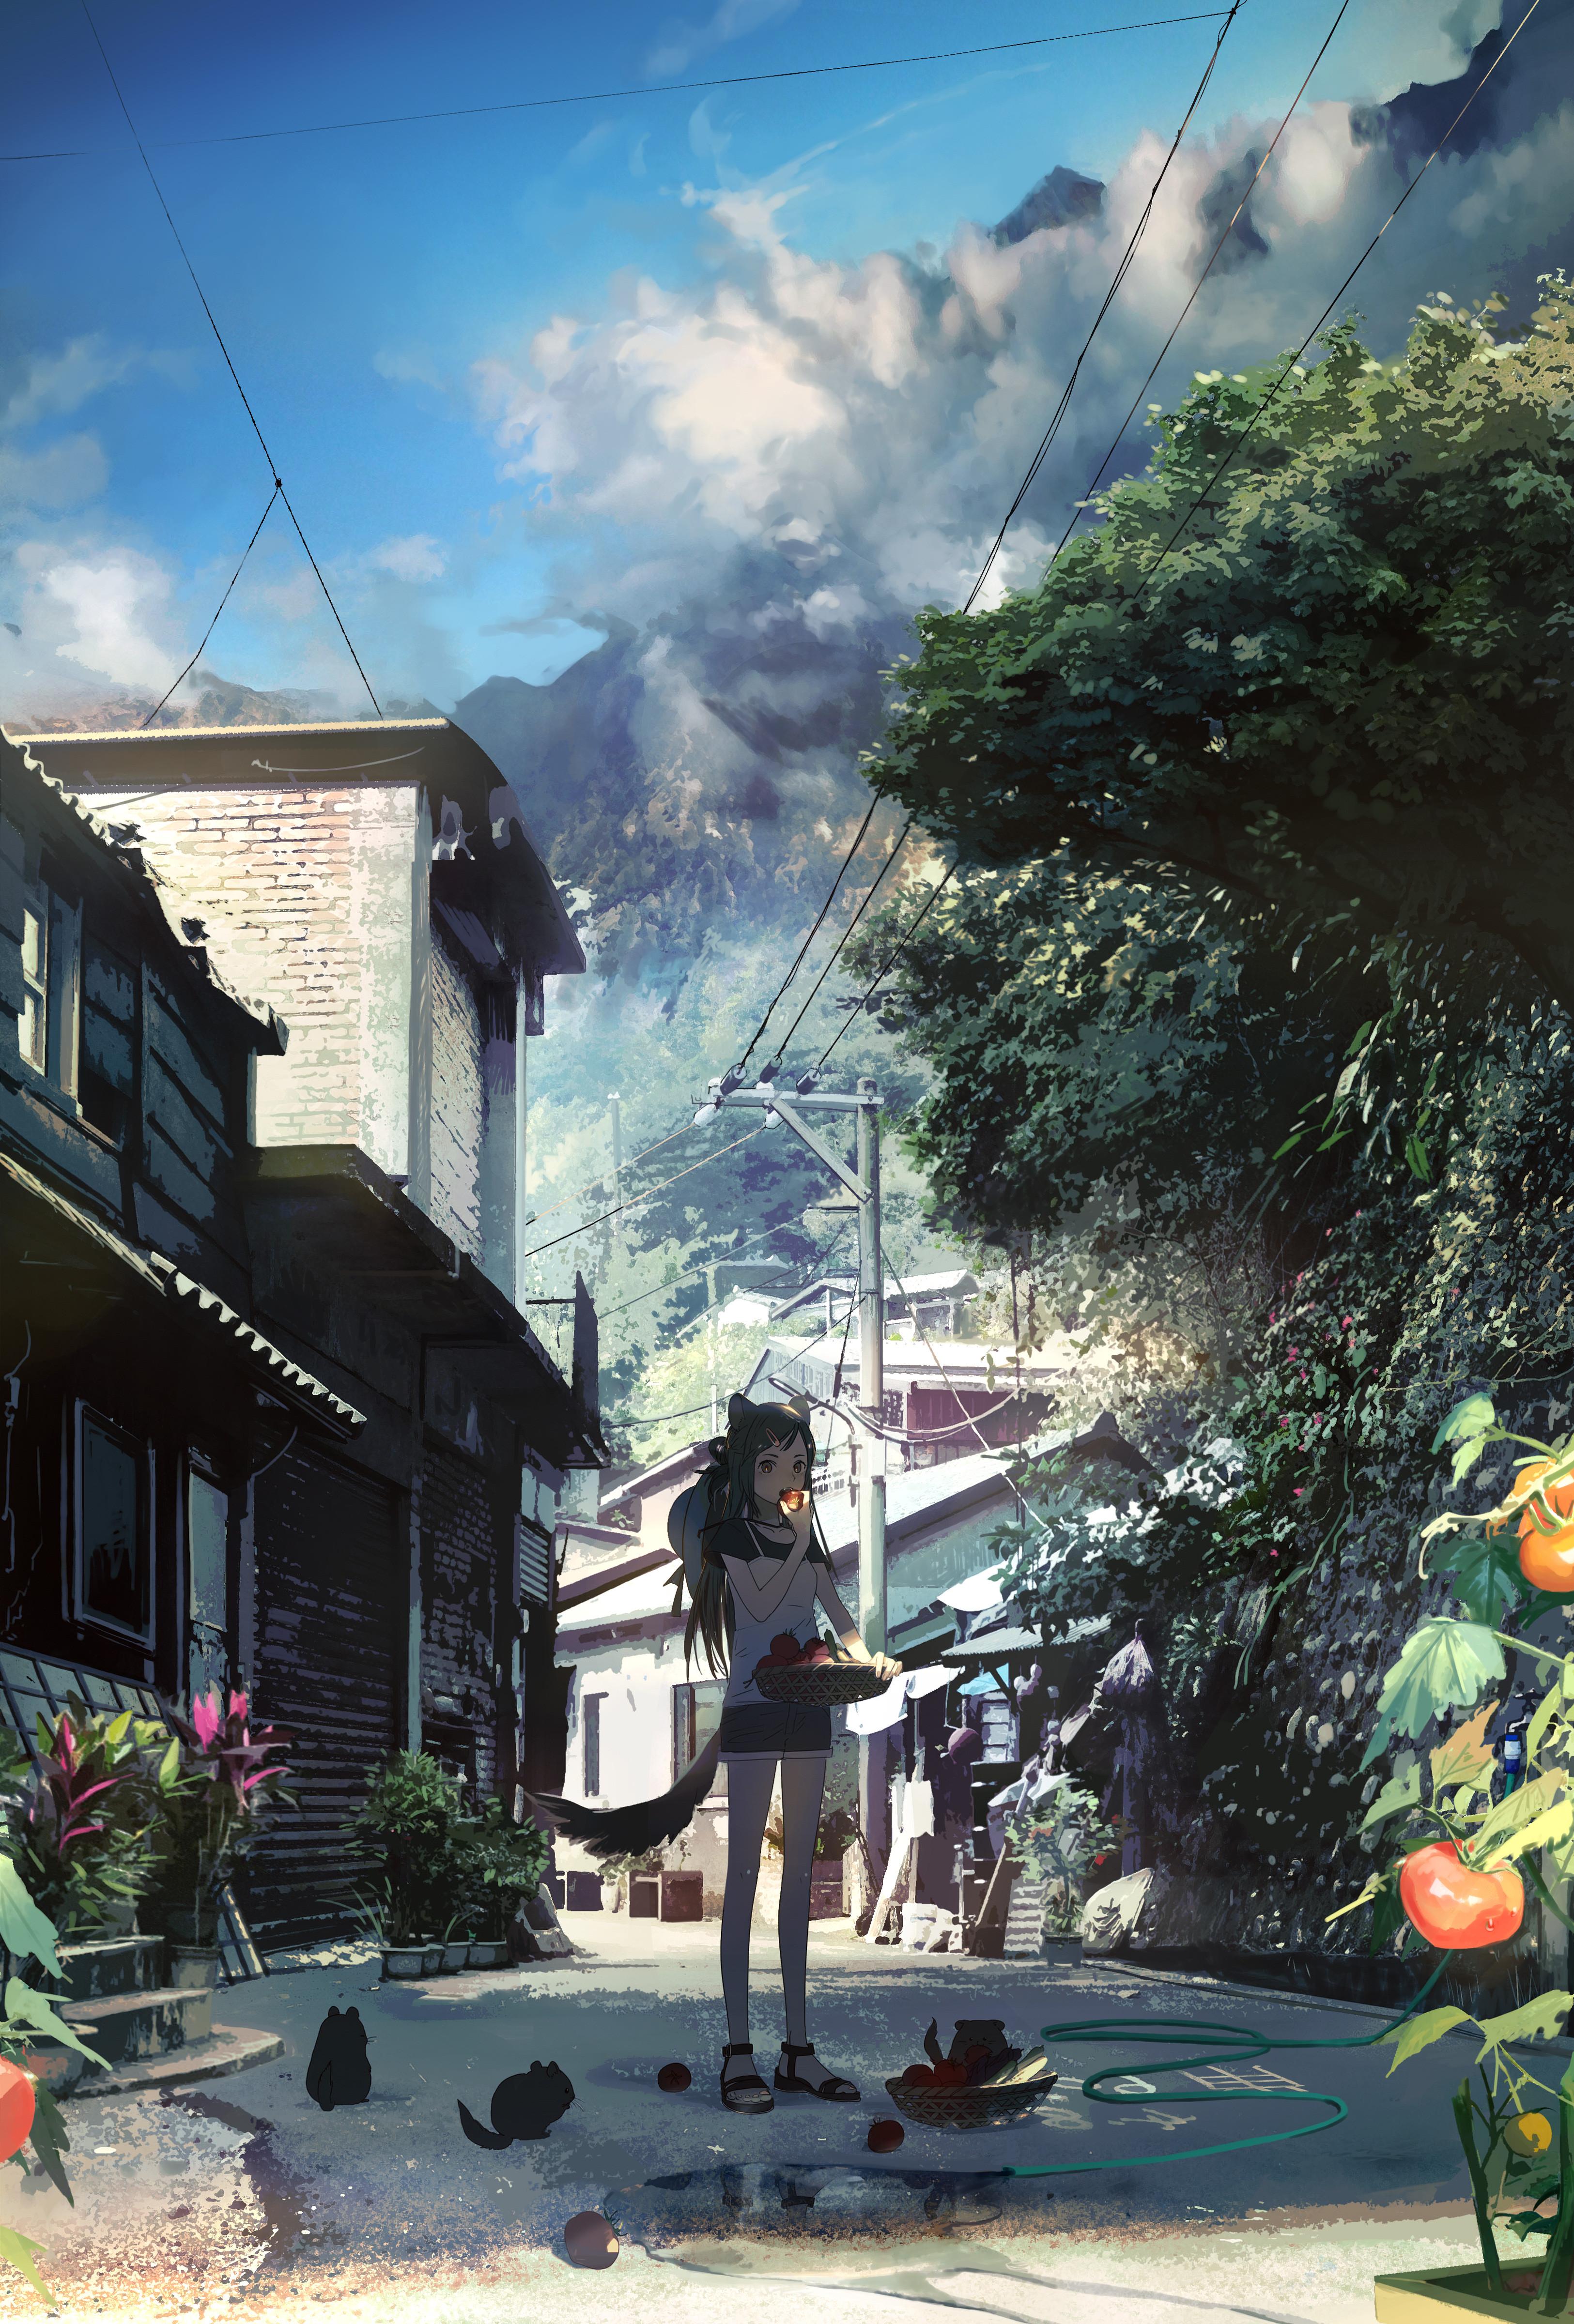 Anime 3250x4800 anime anime girls urban plants Asia